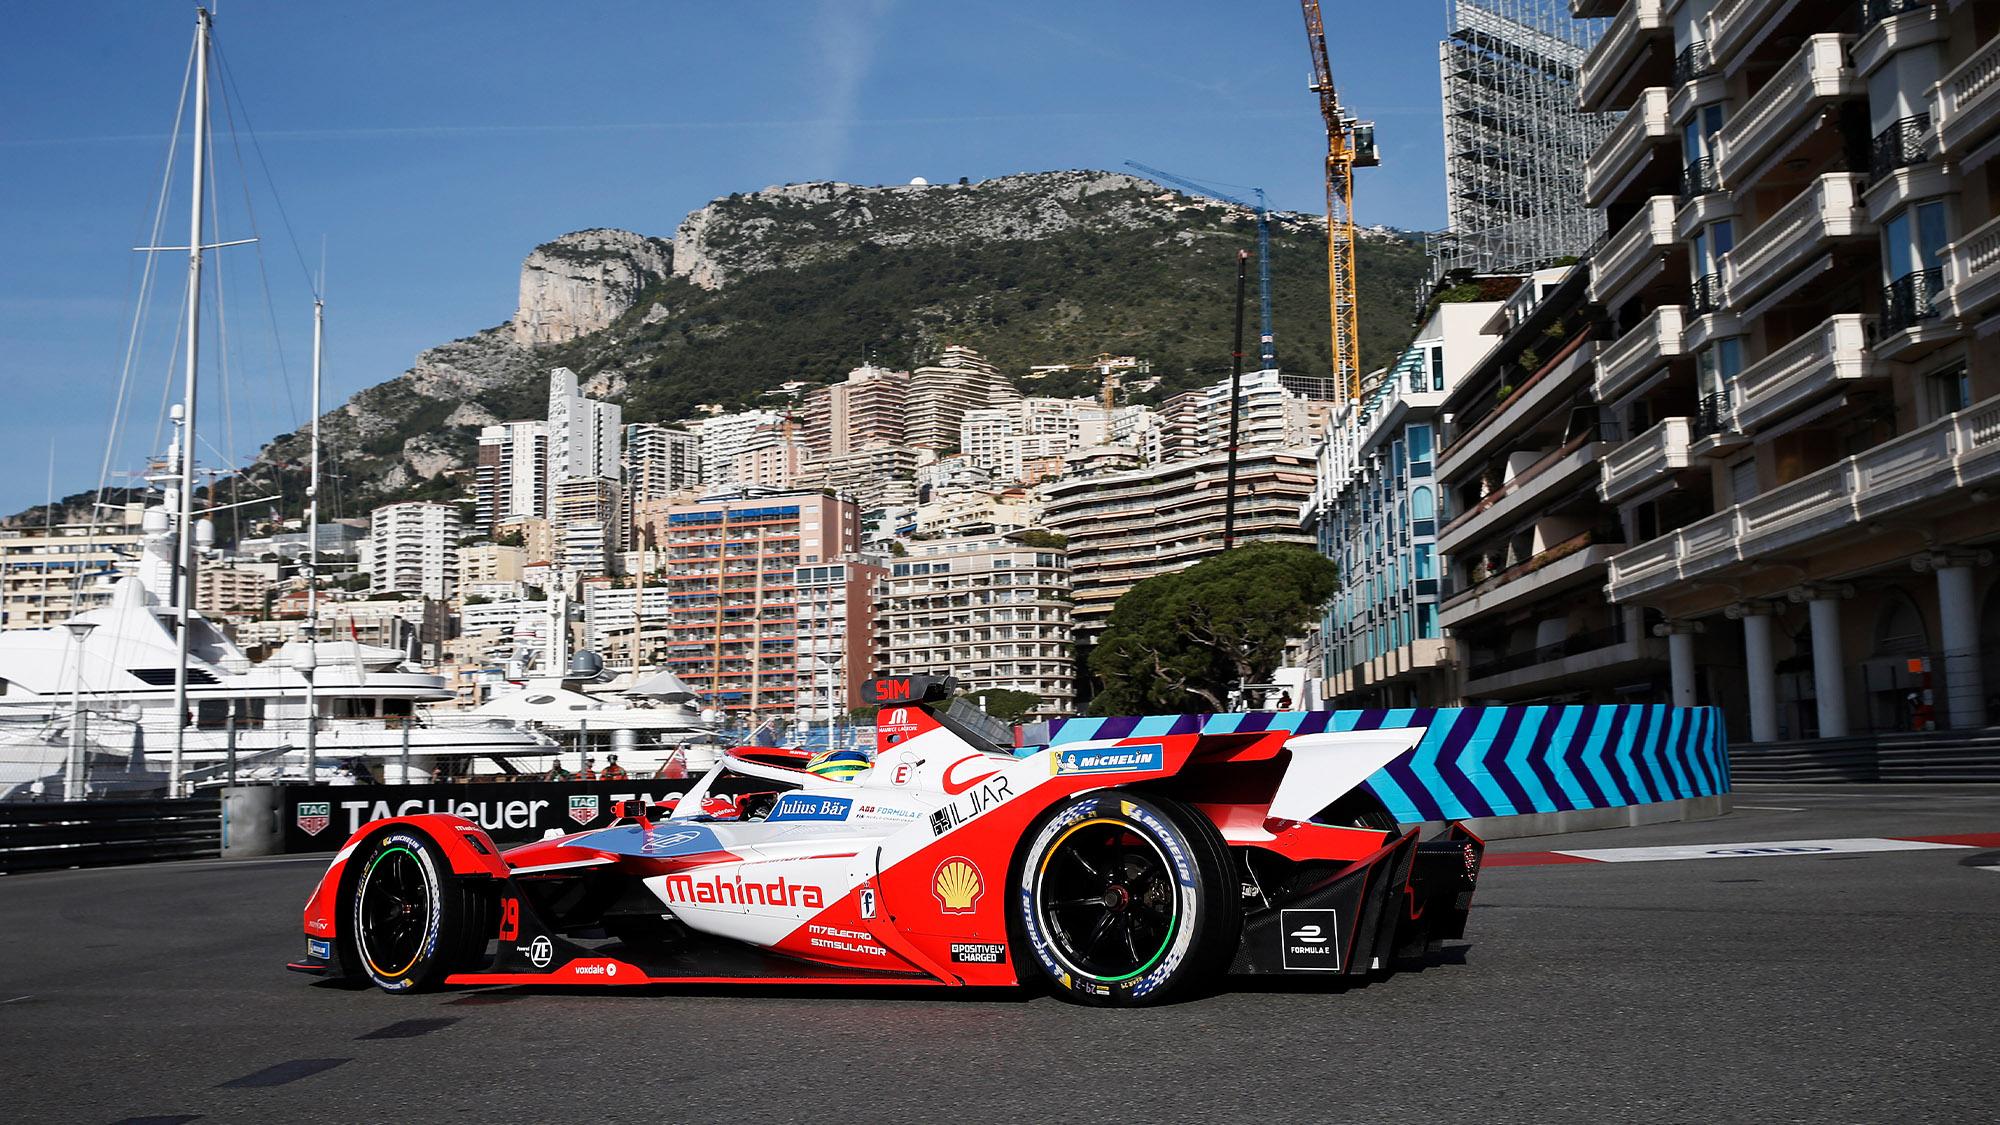 Mahindra Formula E car of Alexander Sims at Monaco in 2021